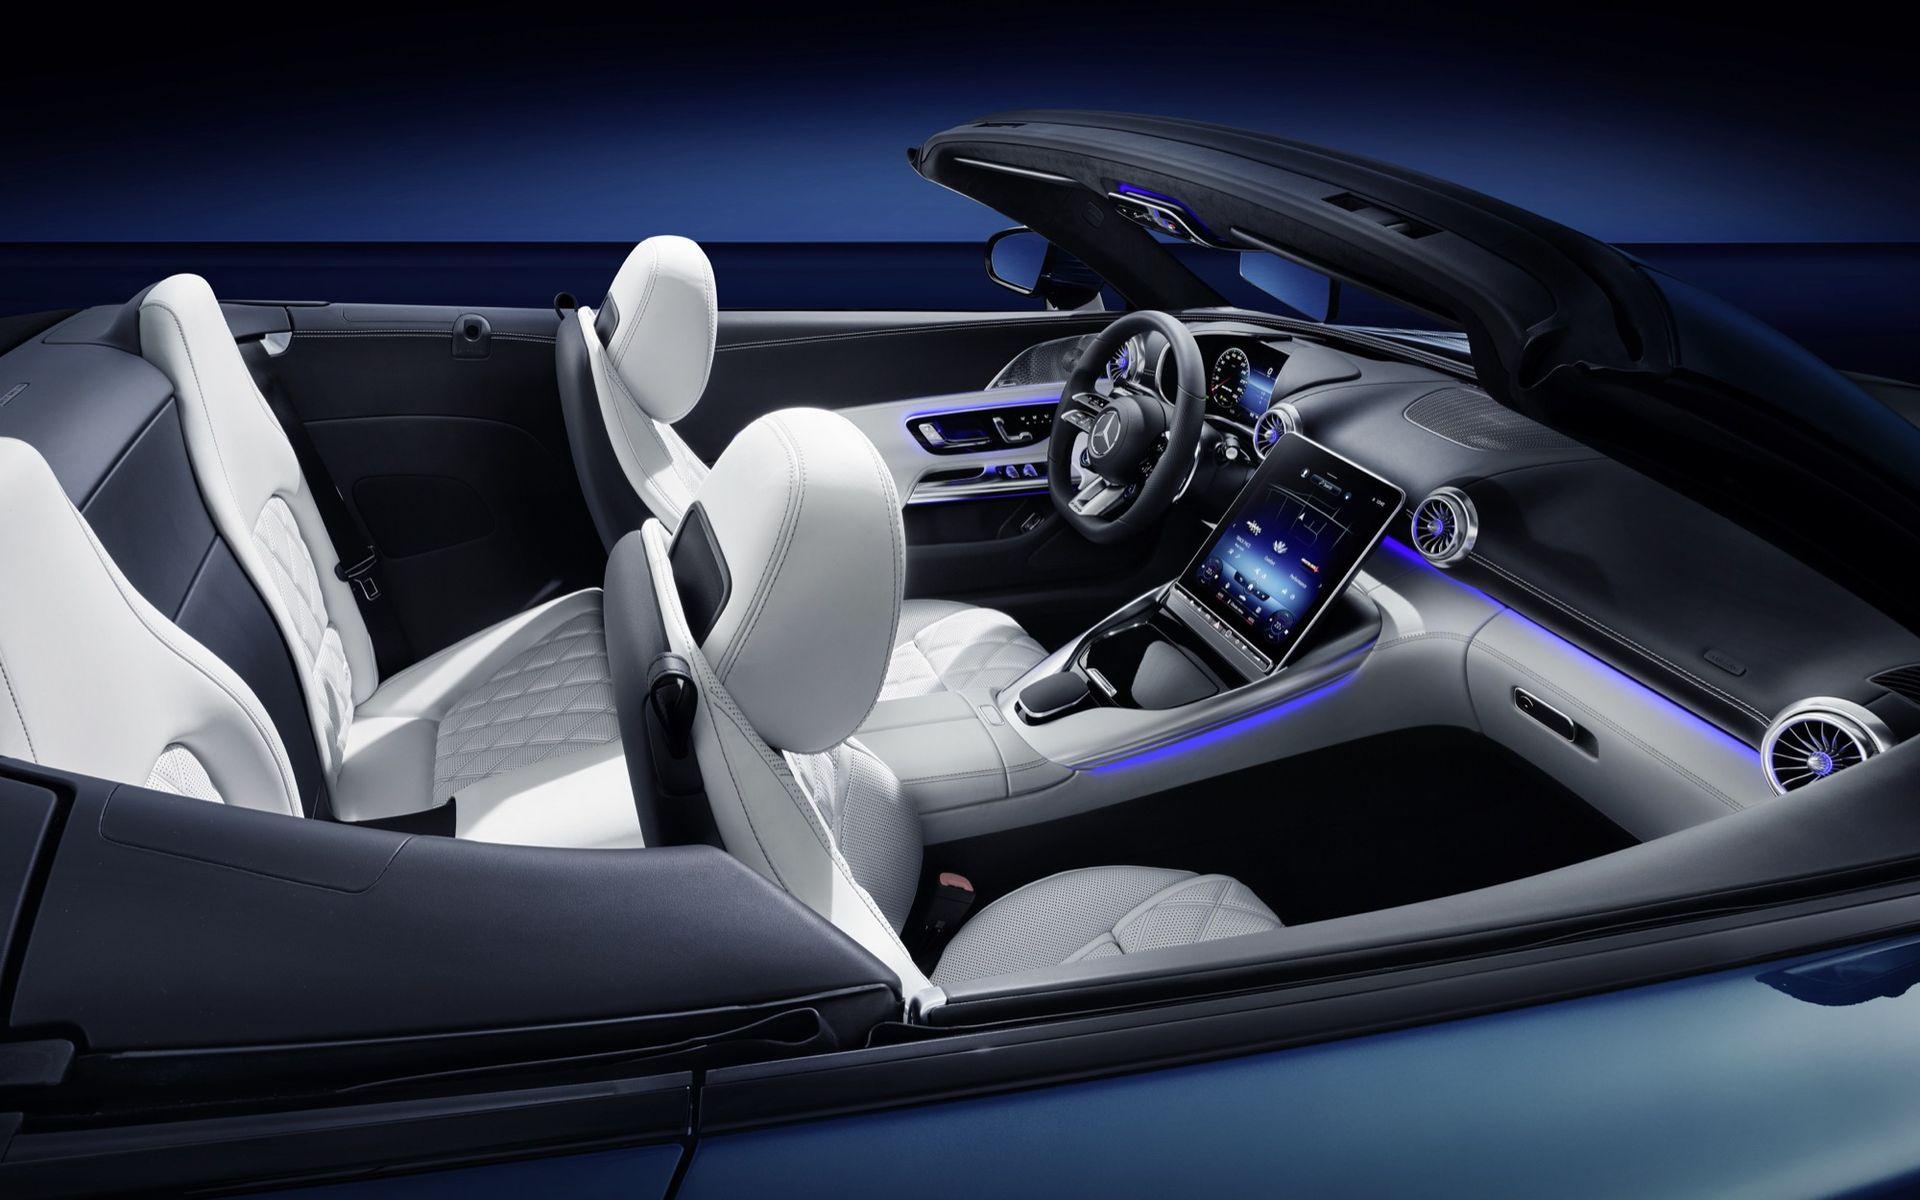 Inredningen på nya Mercedes SL